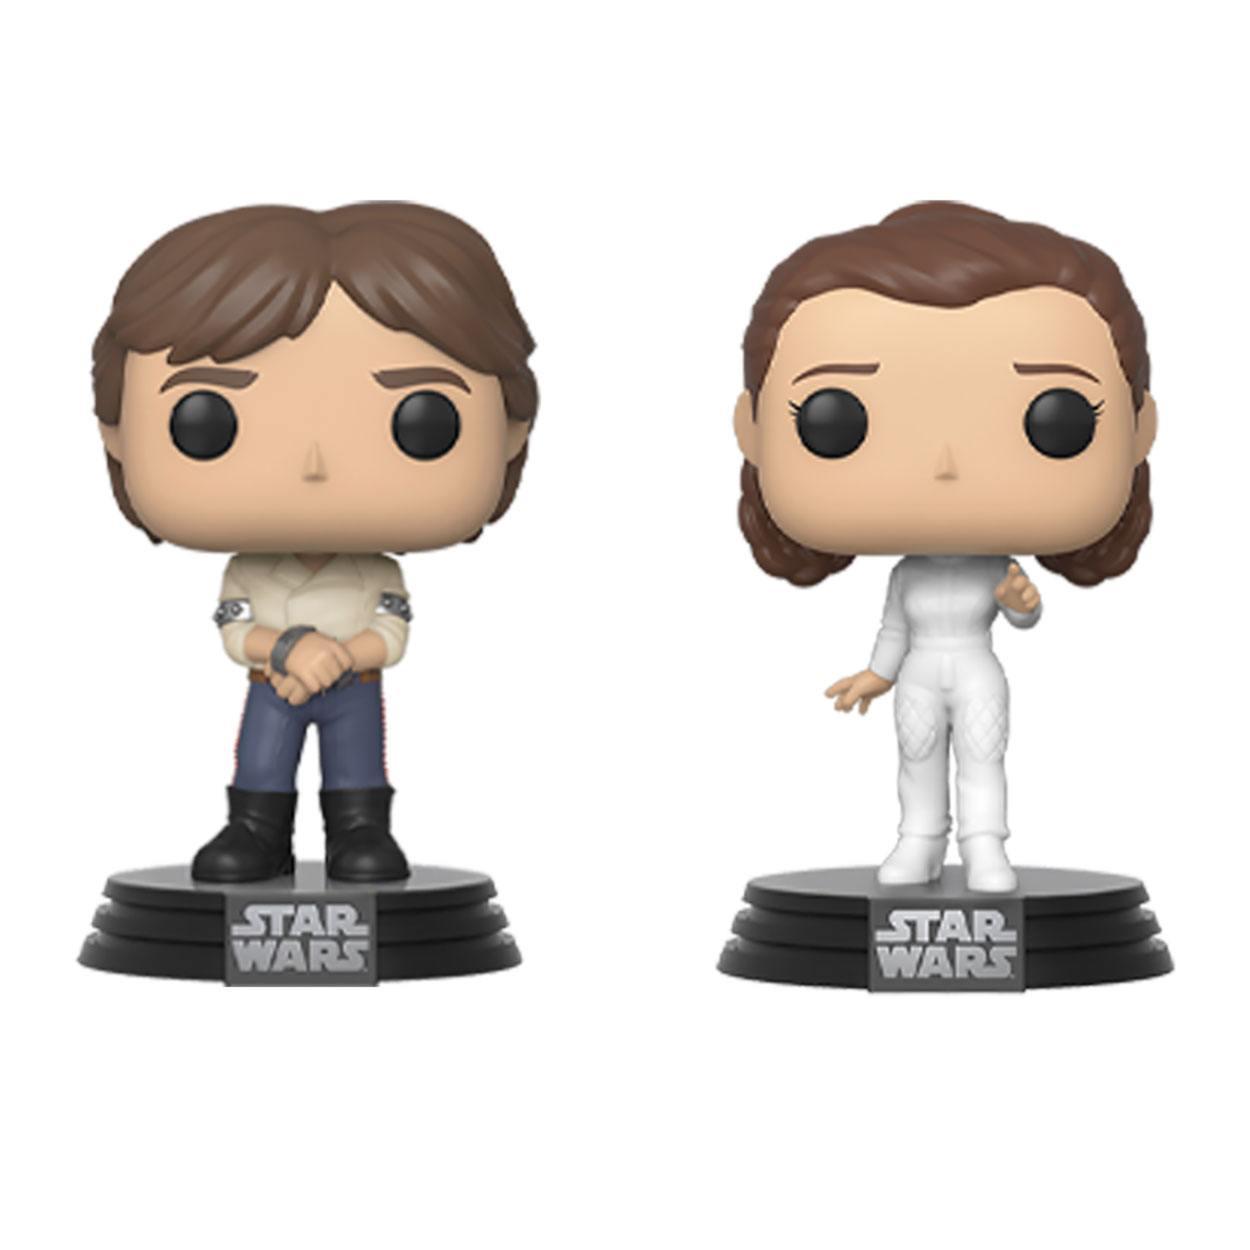 Star Wars POP! Movies Vinyl Figures 2-Pack Han & Leila Empire Strikes Back 40th Anniversary 9 cm